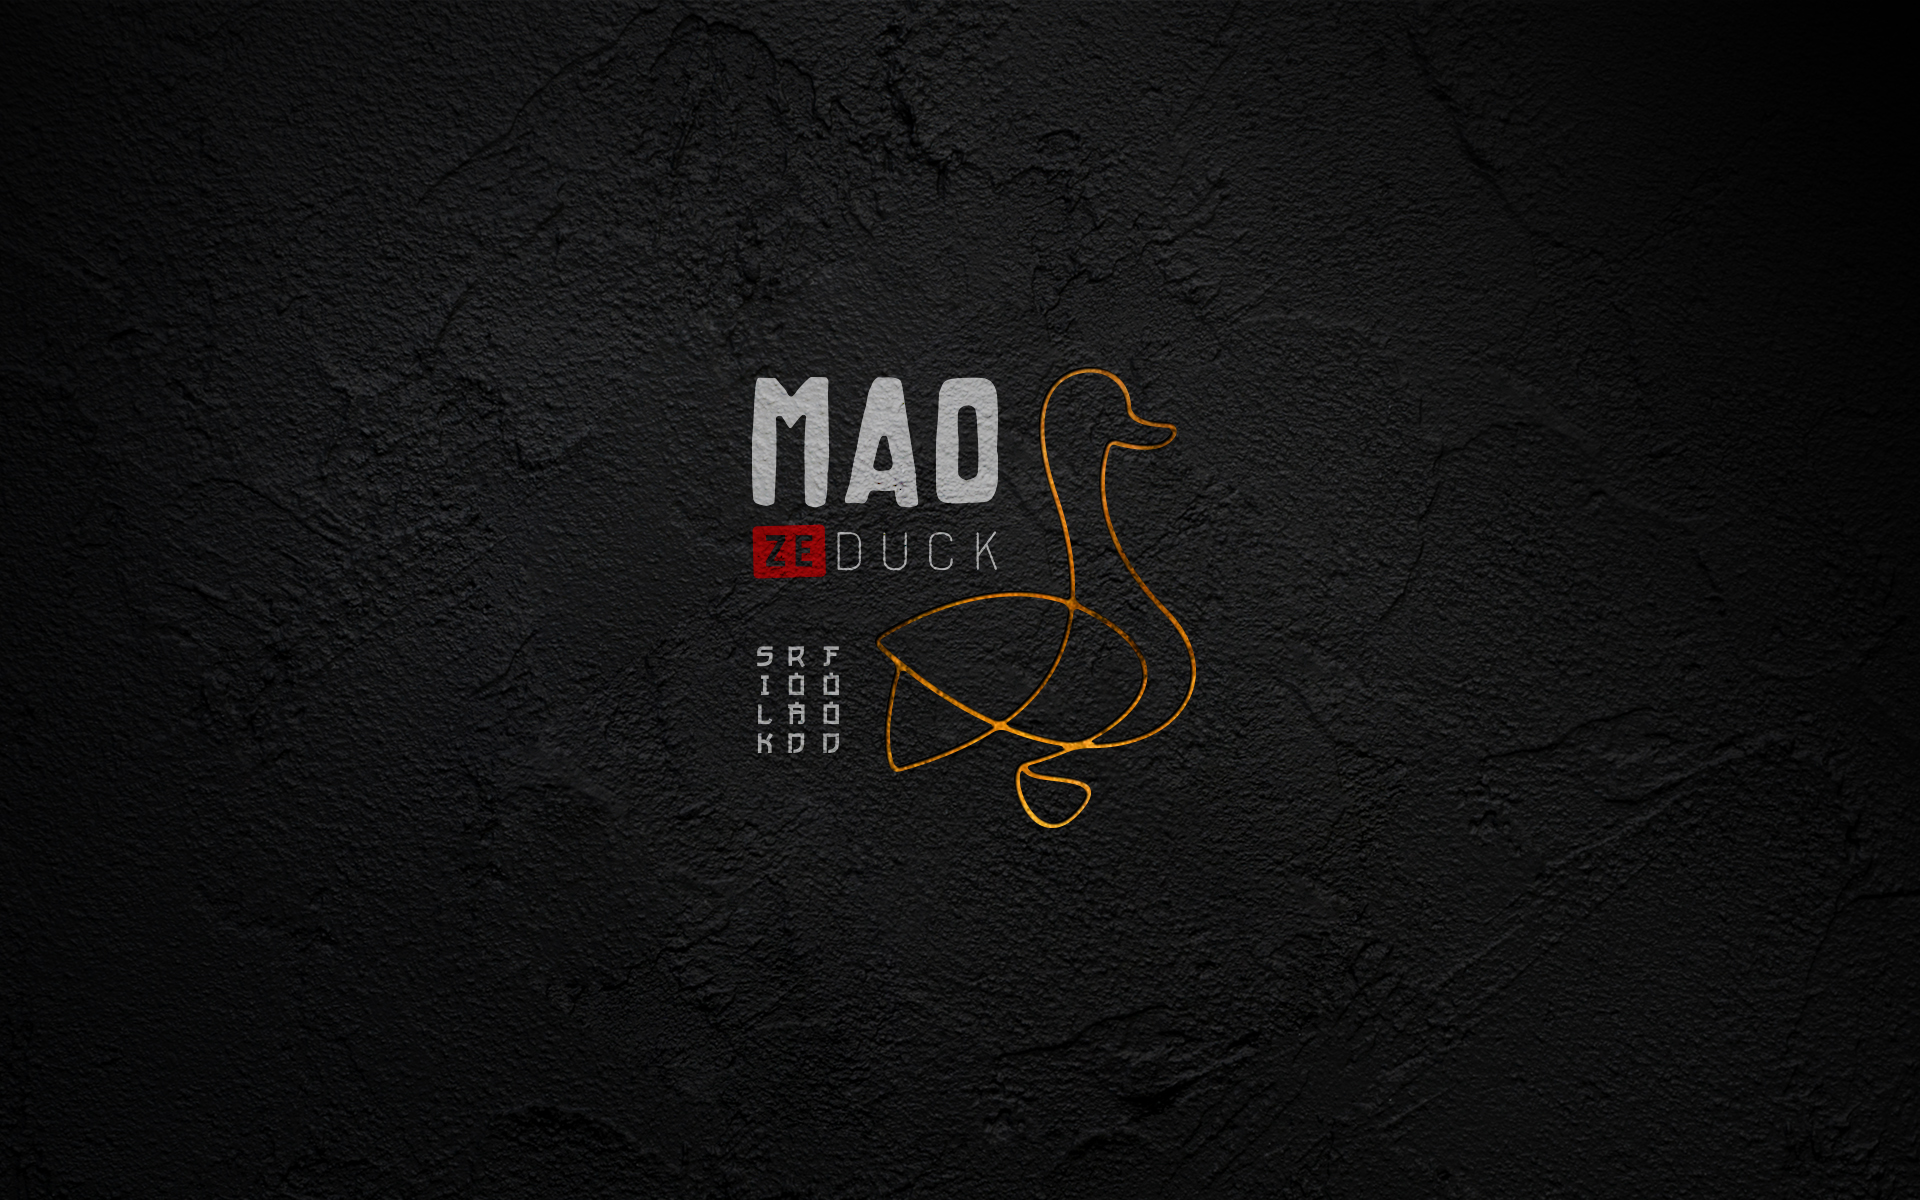 Digital Factory Creates New Restaurant Branding Mao Ze Duck